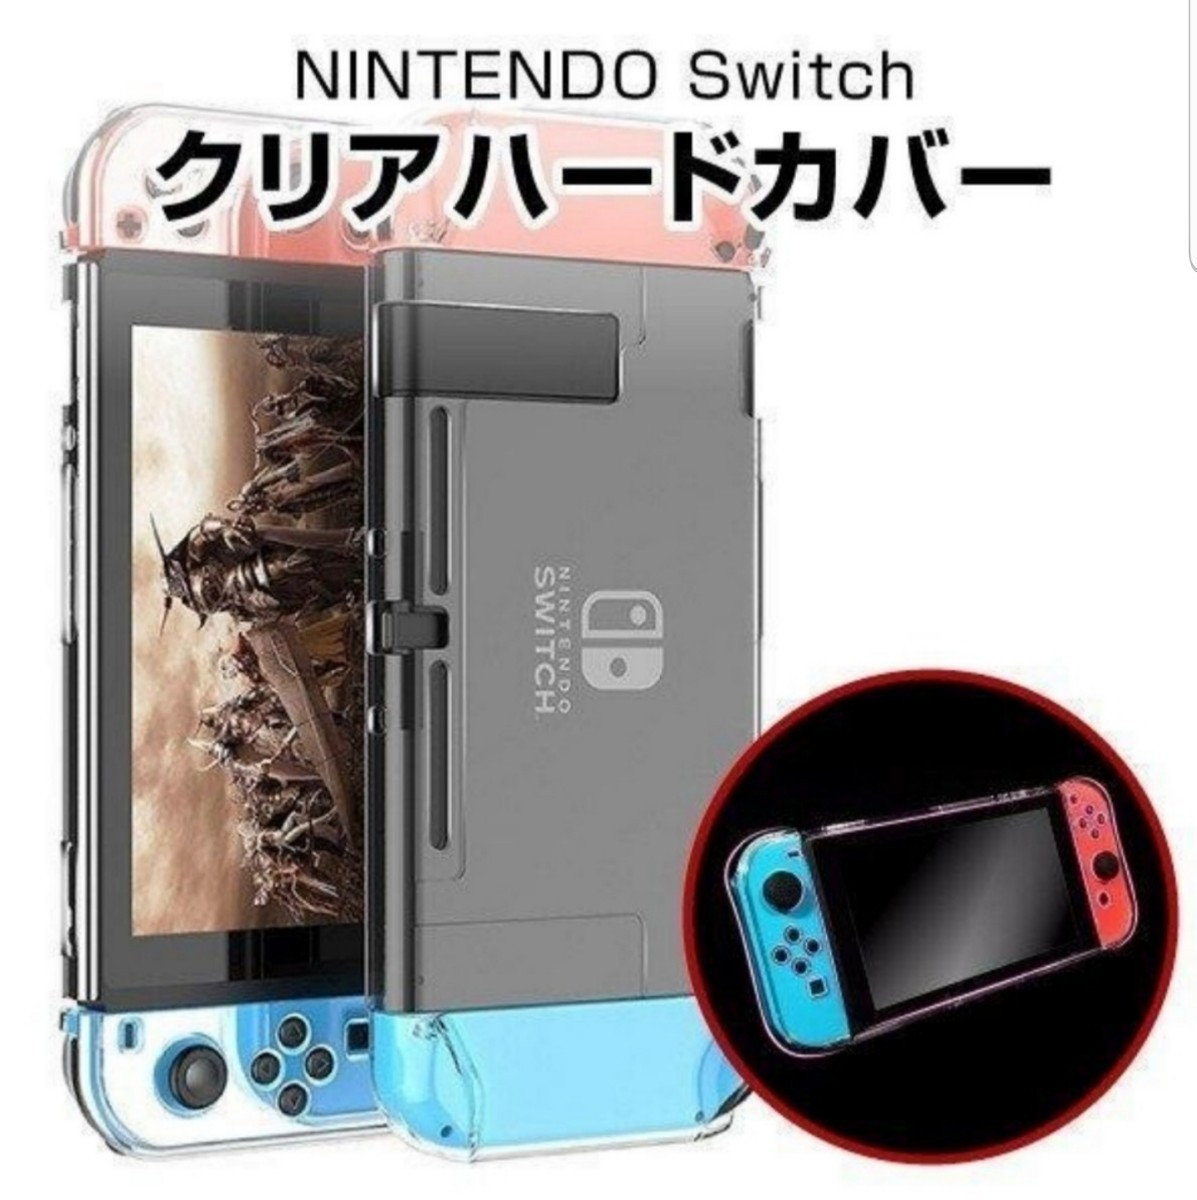 Nintendo switch クリアケース ニンテンドー スイッチ クリアカバ